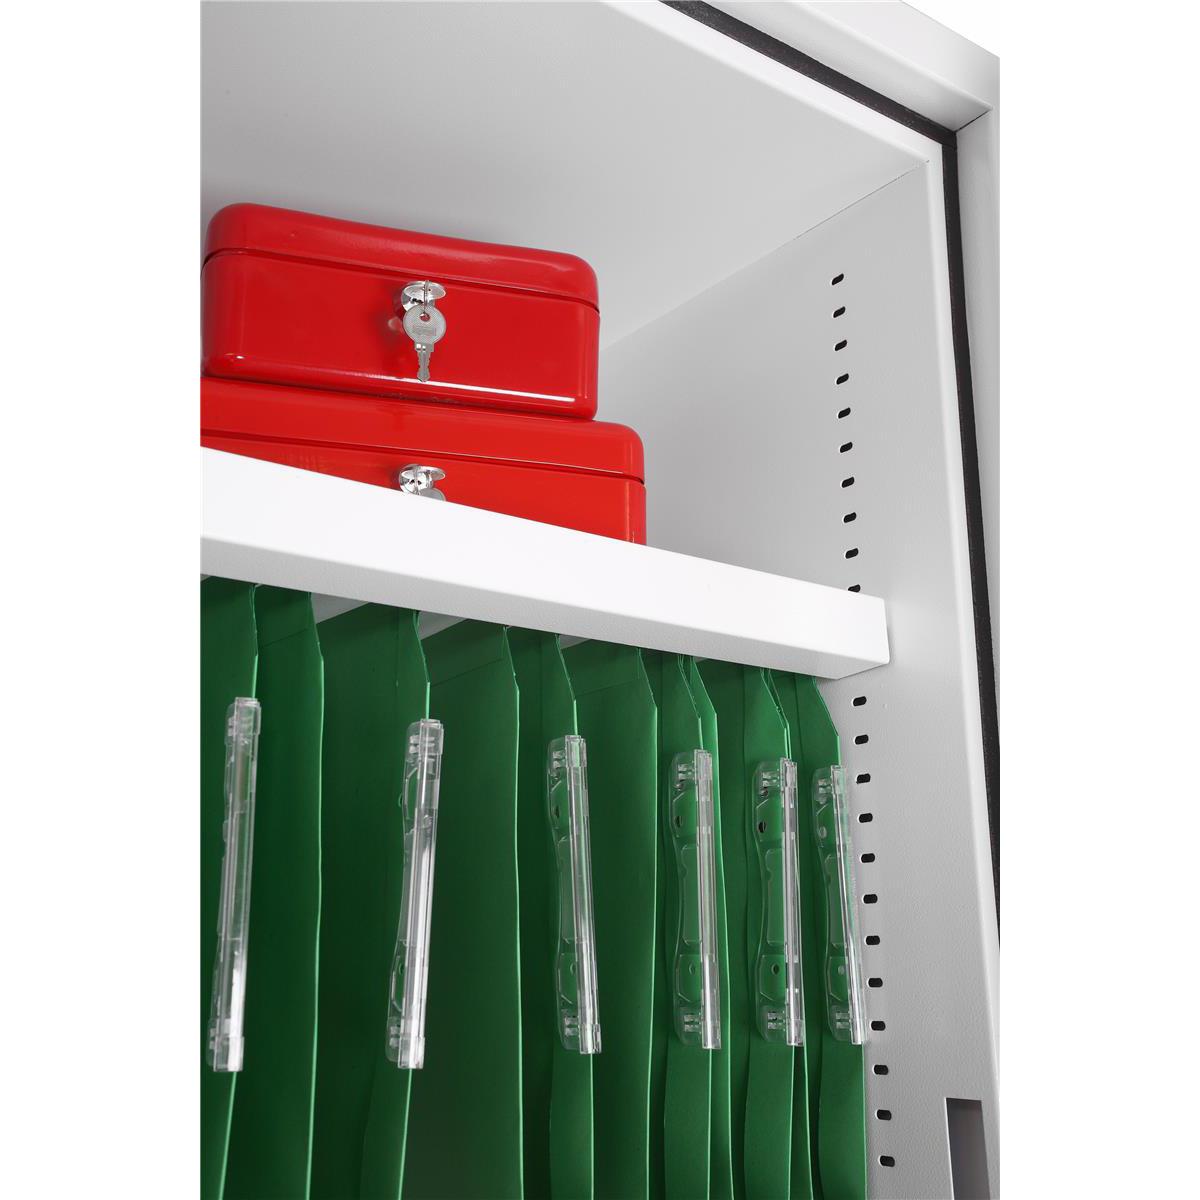 Phoenix Fire Ranger Steel Storage Cupboard Fire and Burglary Resistant W600xD520x1225mm Ref FS1511K